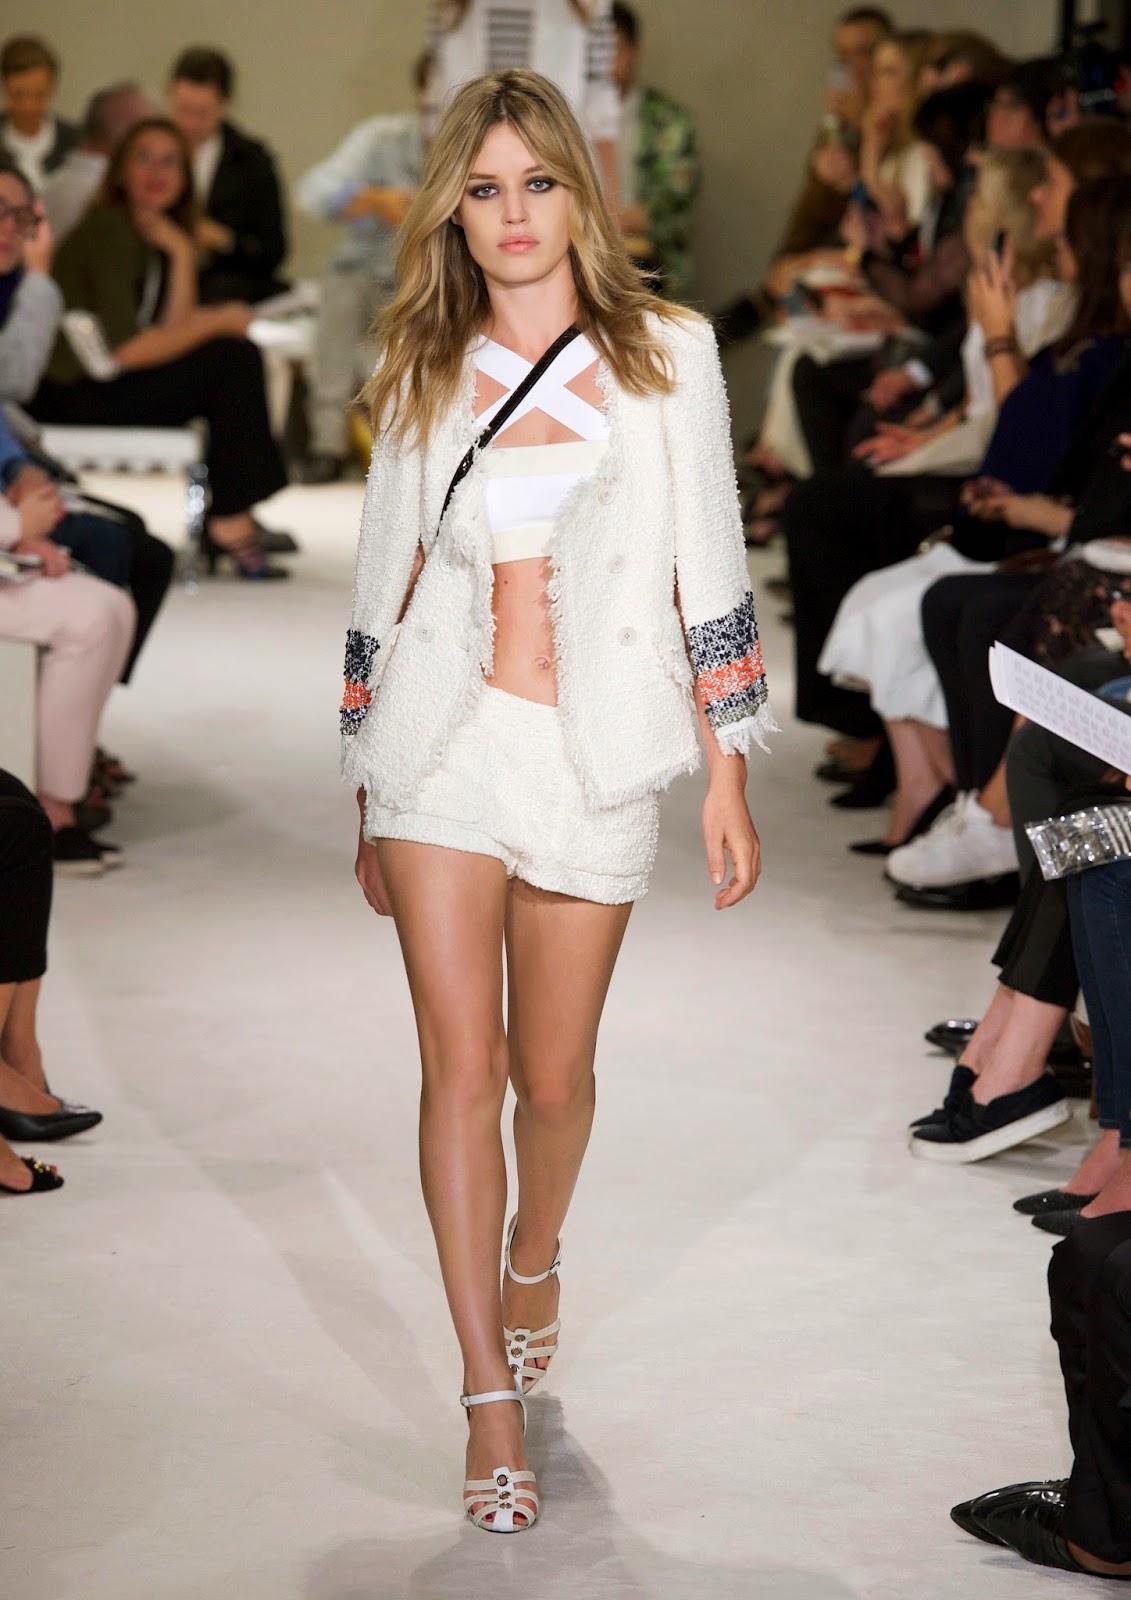 http://www.choupieandco.com/2014/10/mes-looks-favoris-de-la-fashion-week.html